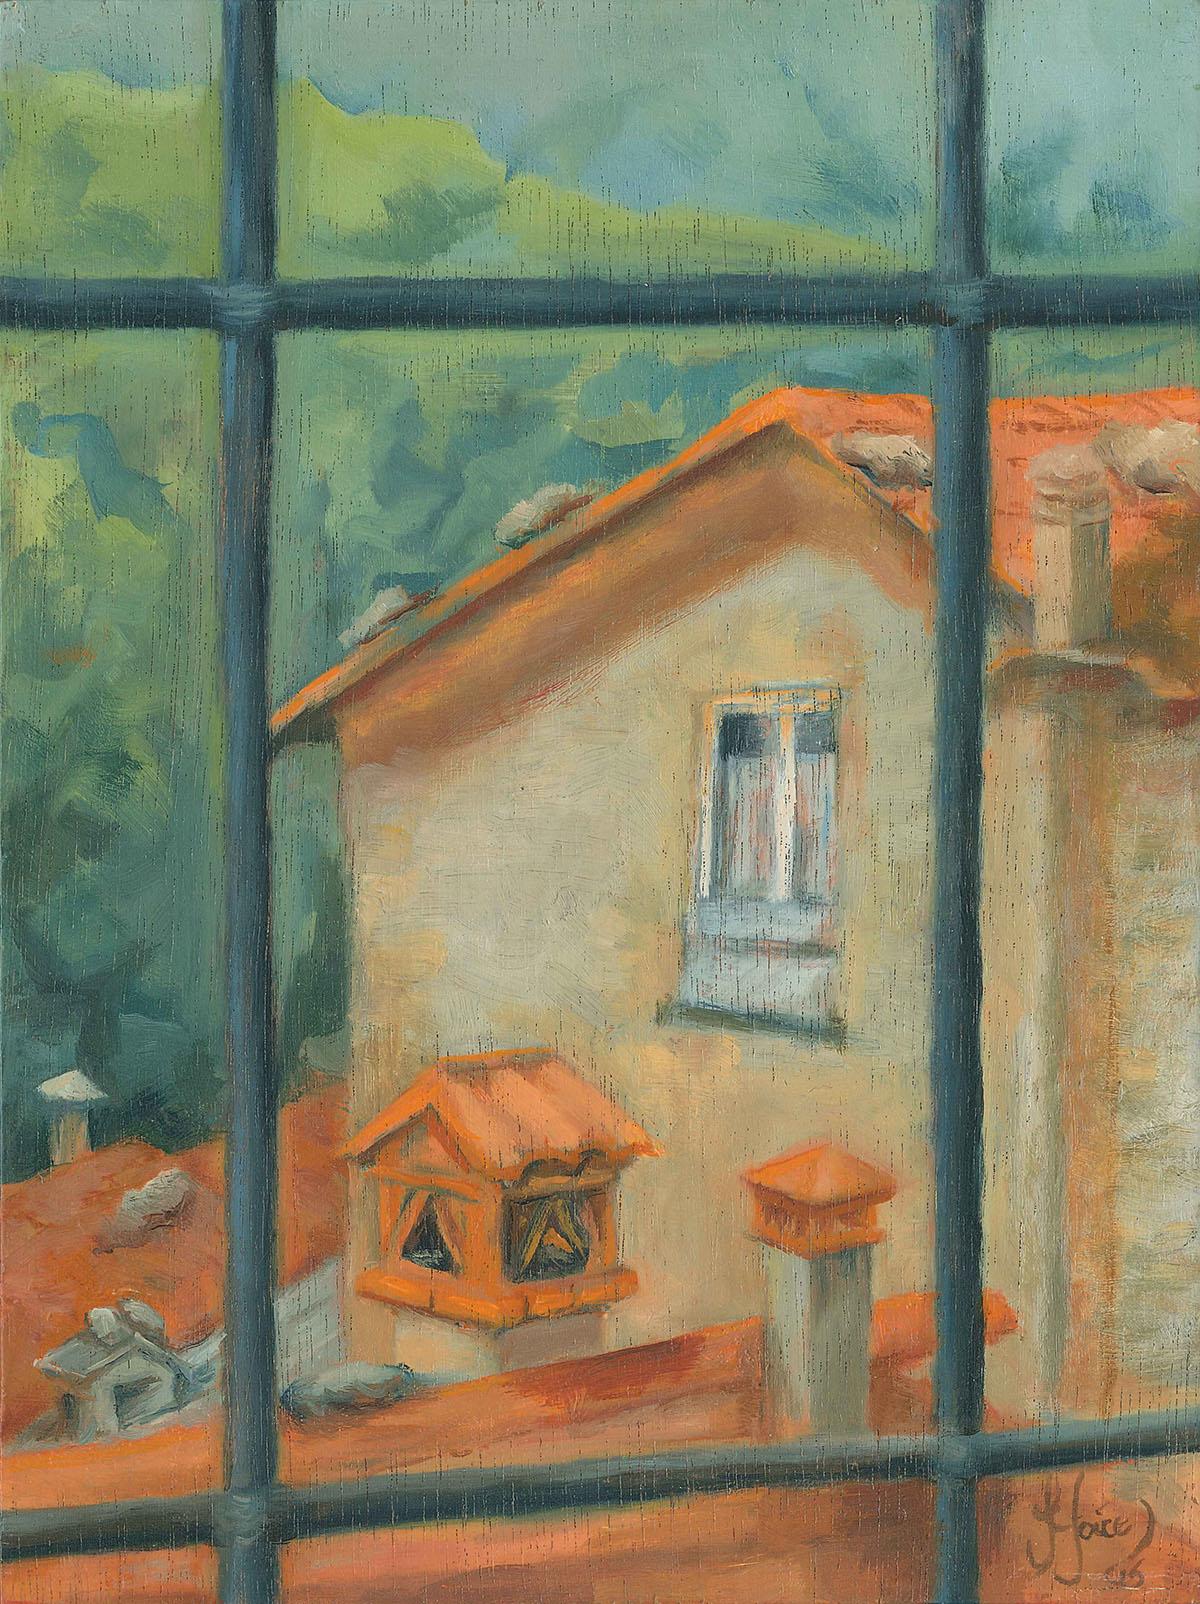 Five Chimneys, Stazzema - Oil on wood - 20 x 15 cm